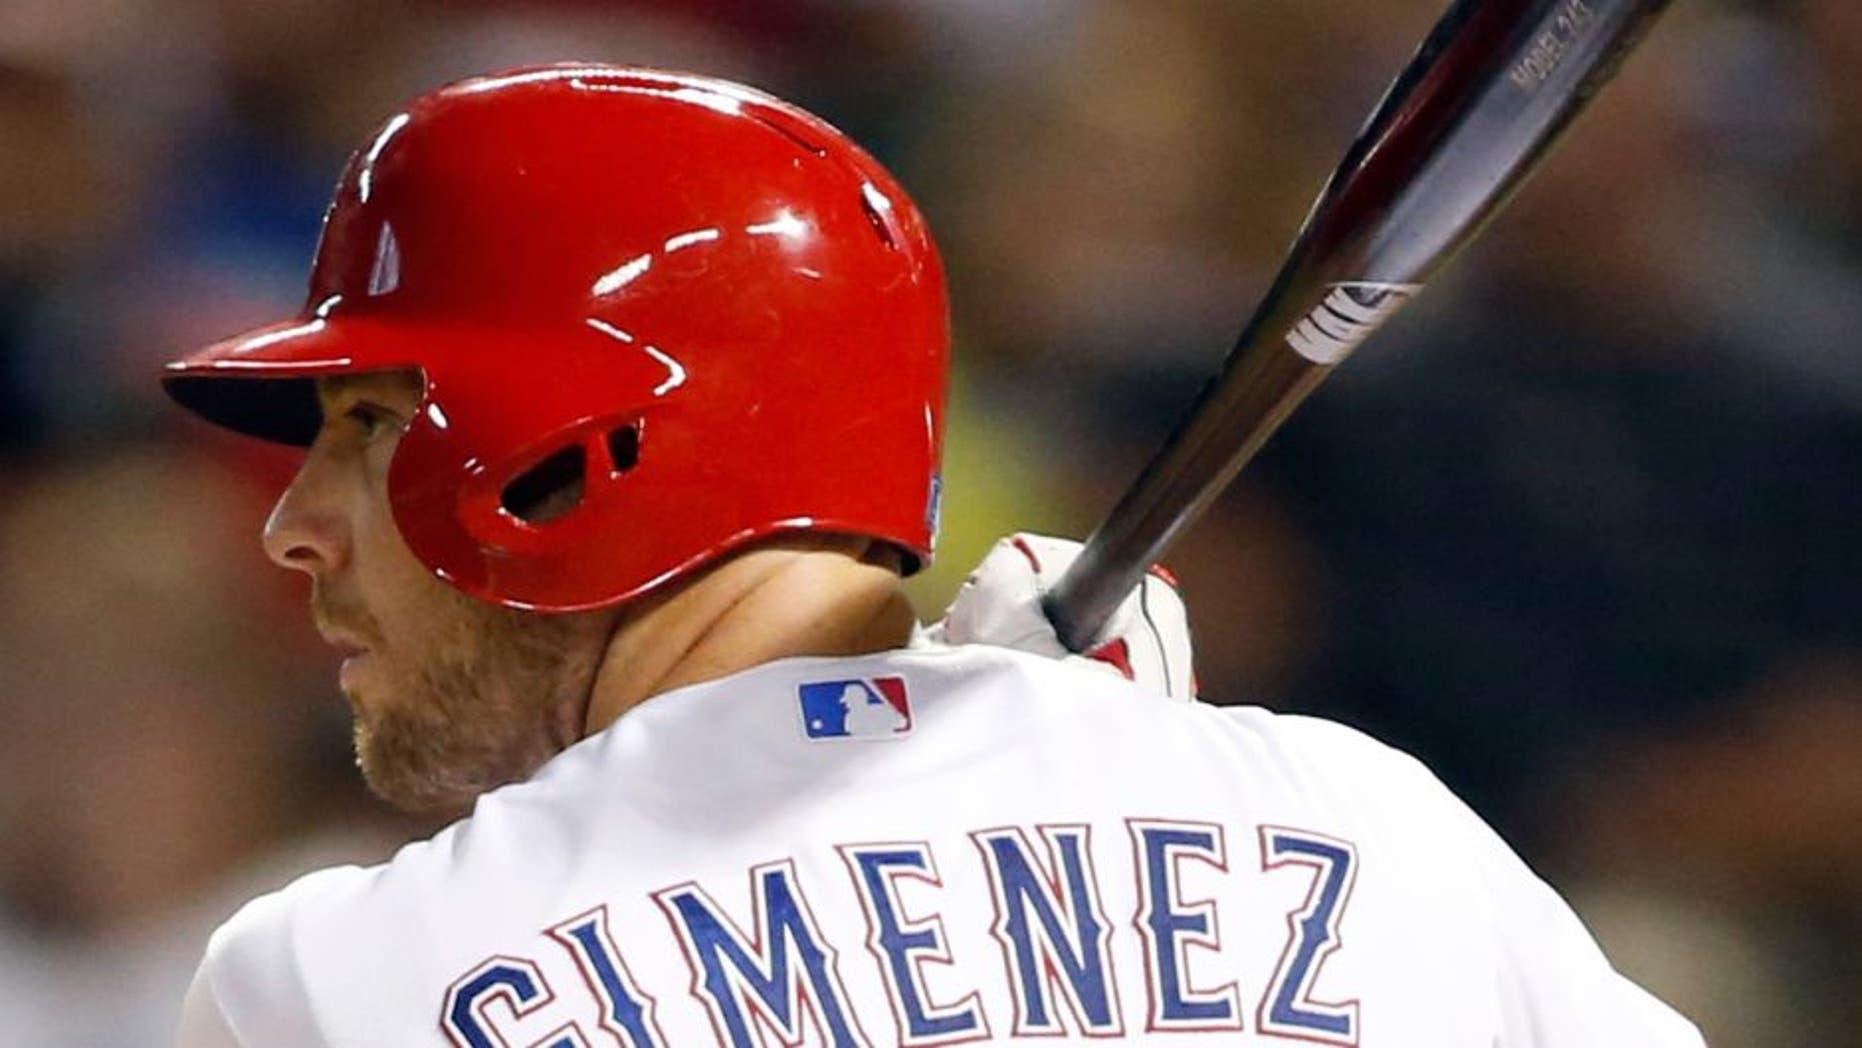 Aug 28, 2015; Arlington, TX, USA; Texas Rangers catcher Chris Gimenez (38) bats in the seventh inning against the Baltimore Orioles at Globe Life Park in Arlington. Texas won 4-1. Mandatory Credit: Tim Heitman-USA TODAY Sports